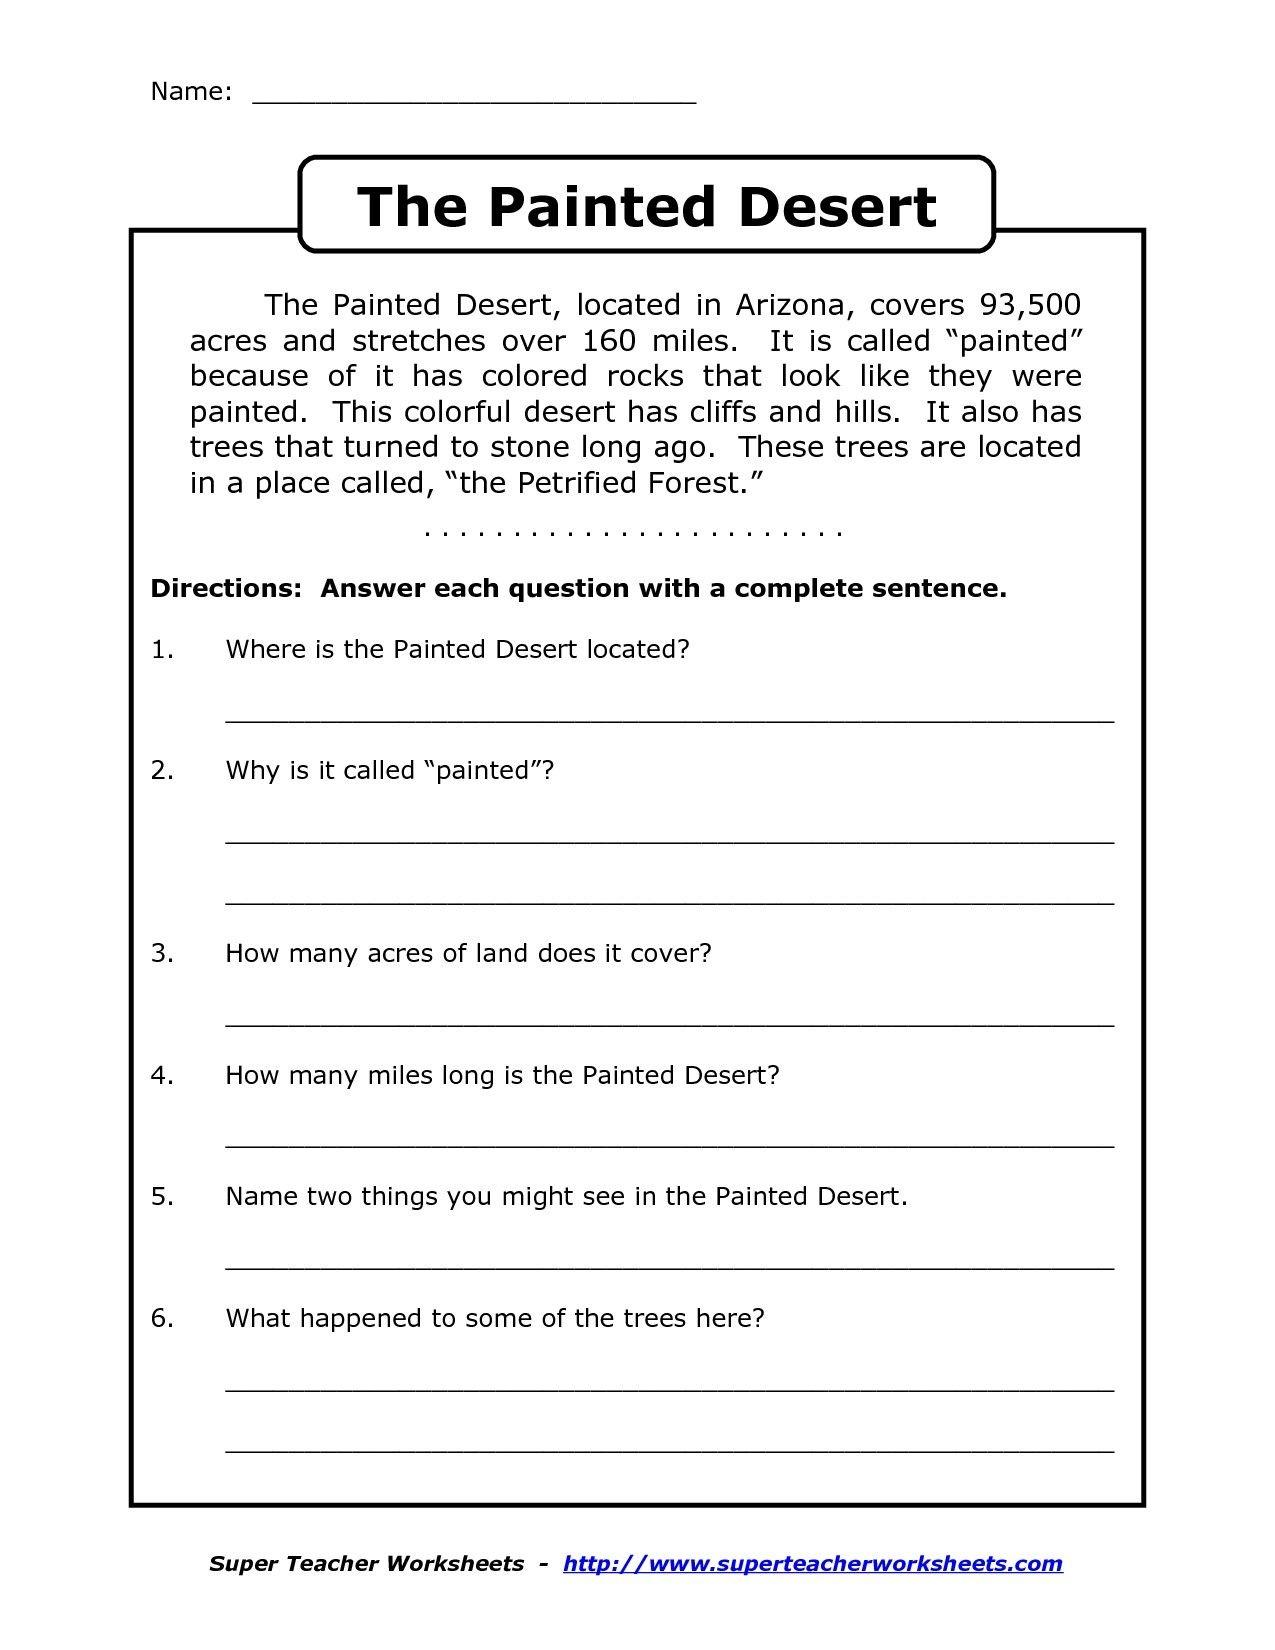 Image Result For Free Printable Worksheets For Grade 4 Comprehension - Free Printable Phonics Worksheets For 4Th Grade